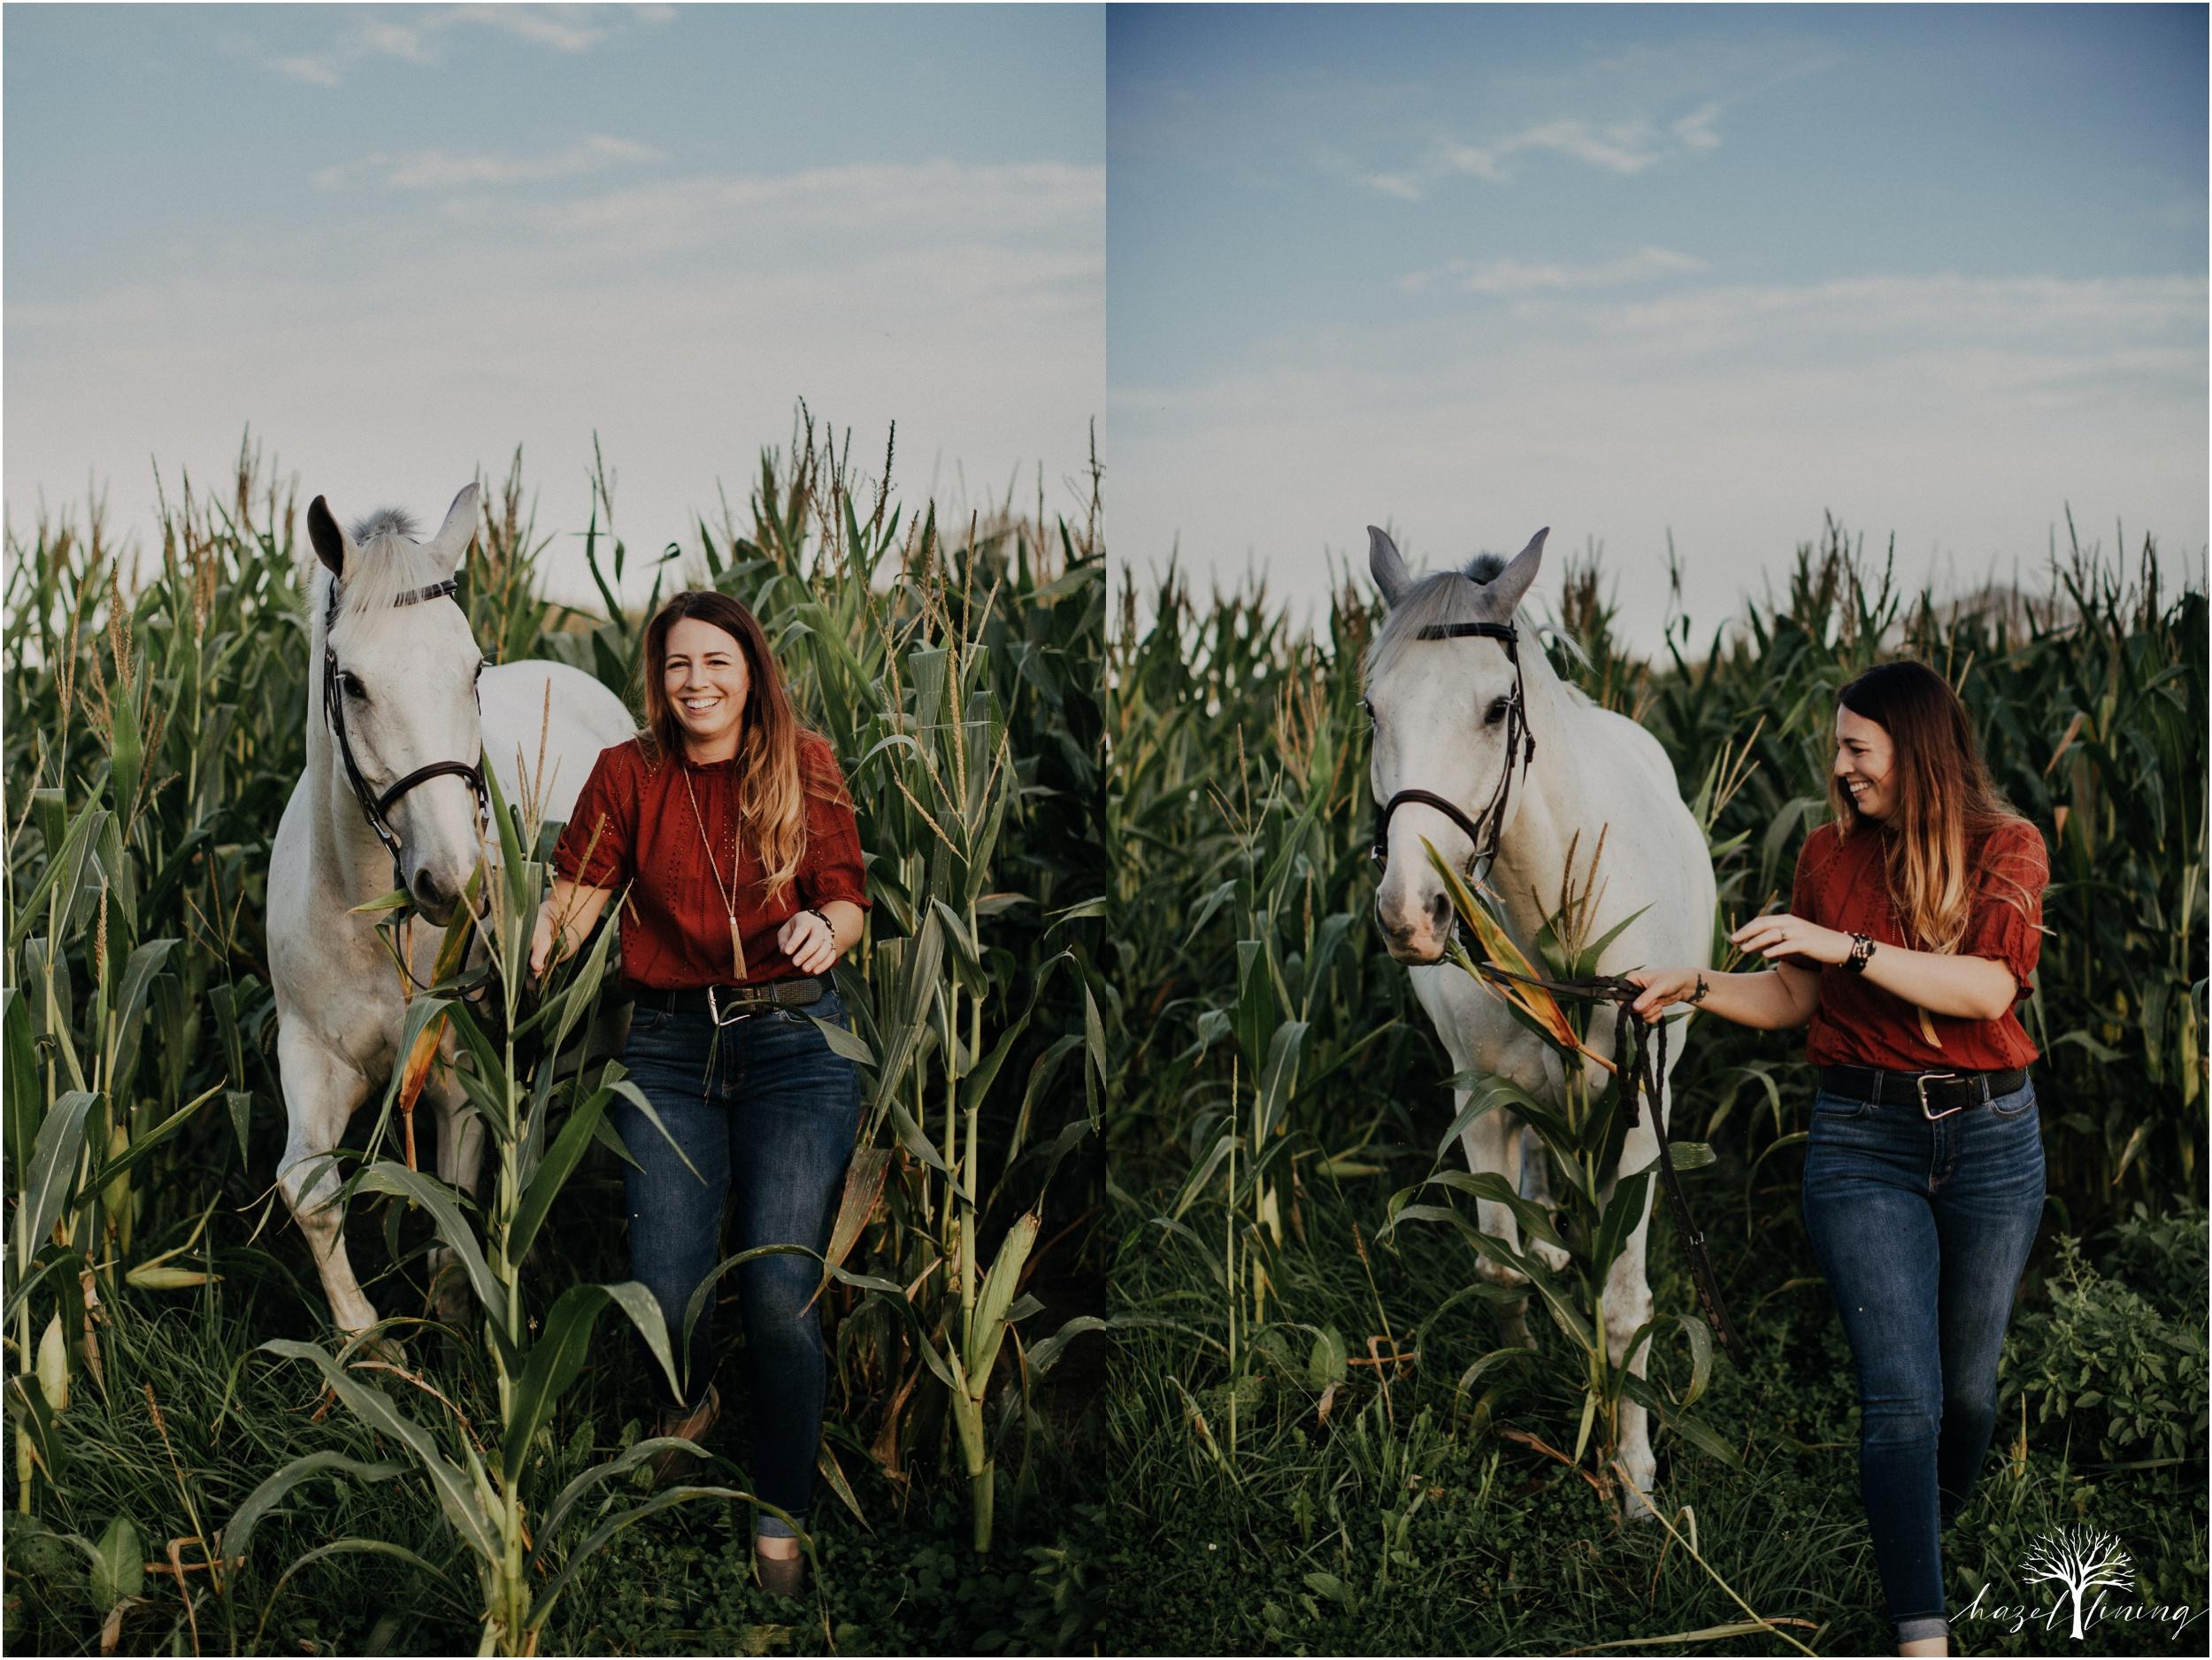 taylor-adams-and-horse-delaware-valley-university-delval-summer-equestrian-portrait-session-hazel-lining-photography-destination-elopement-wedding-engagement-photography_0029.jpg